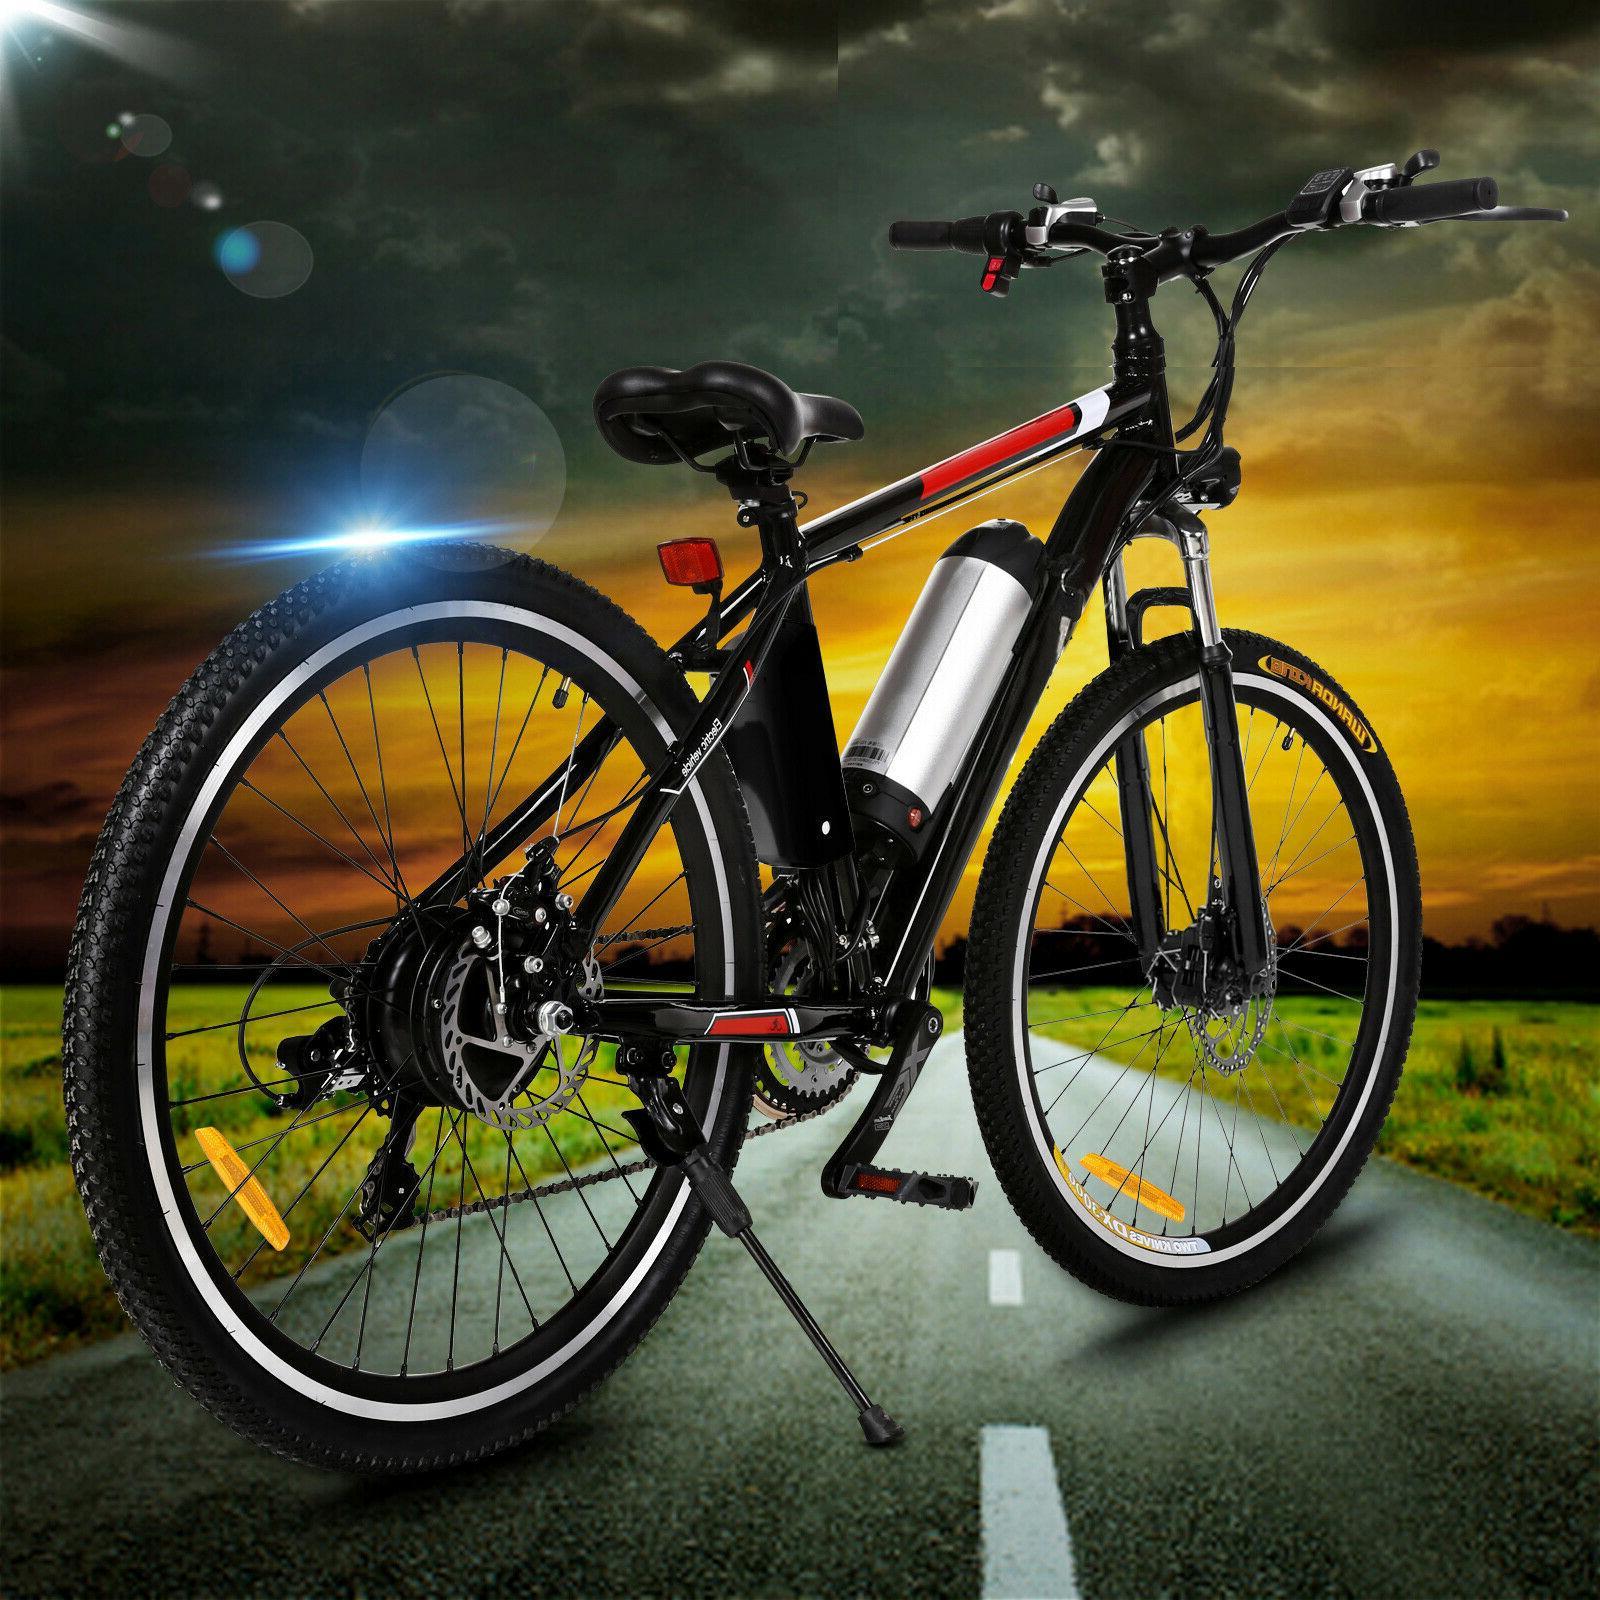 26 Electric Bike for Adults, Electric Mountain Commuting Bike new